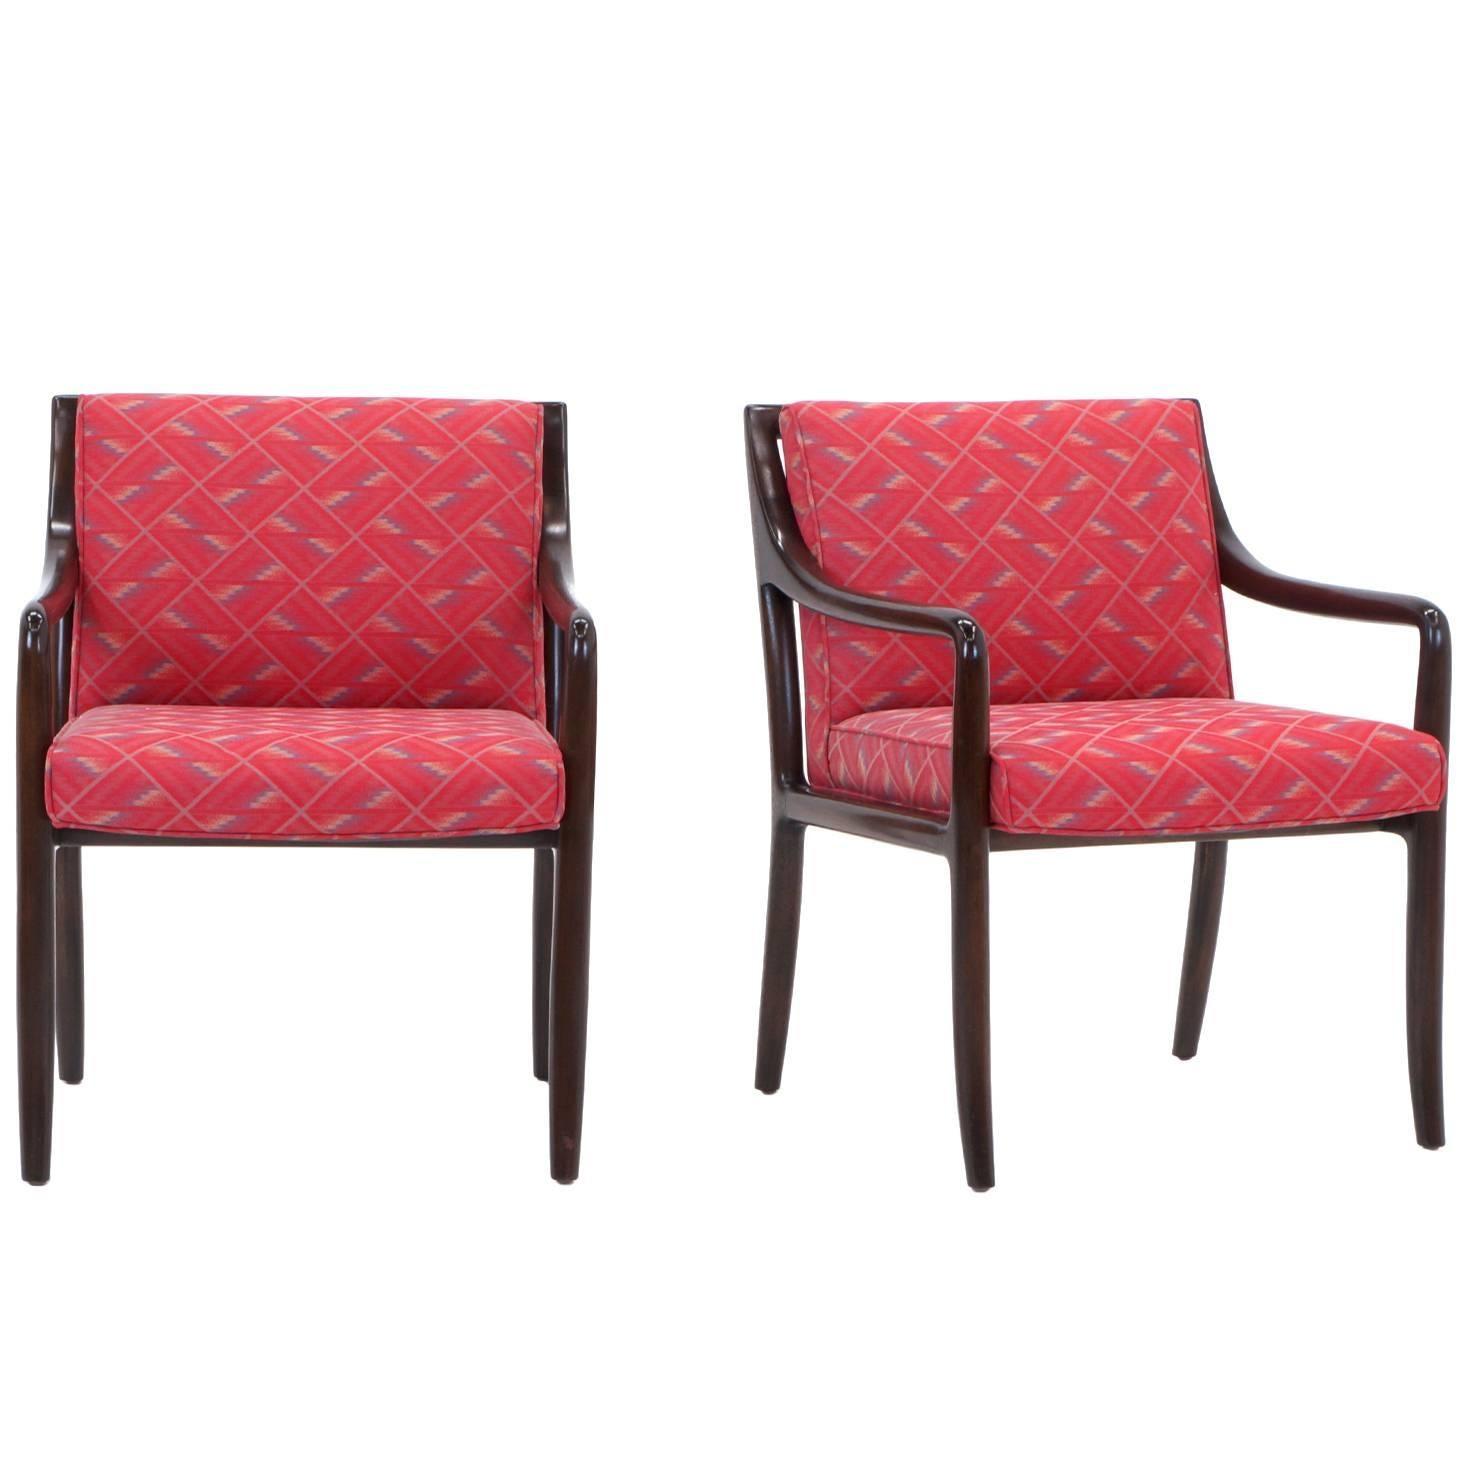 Pair of Edward Wormley for Dunbar Side Armchairs